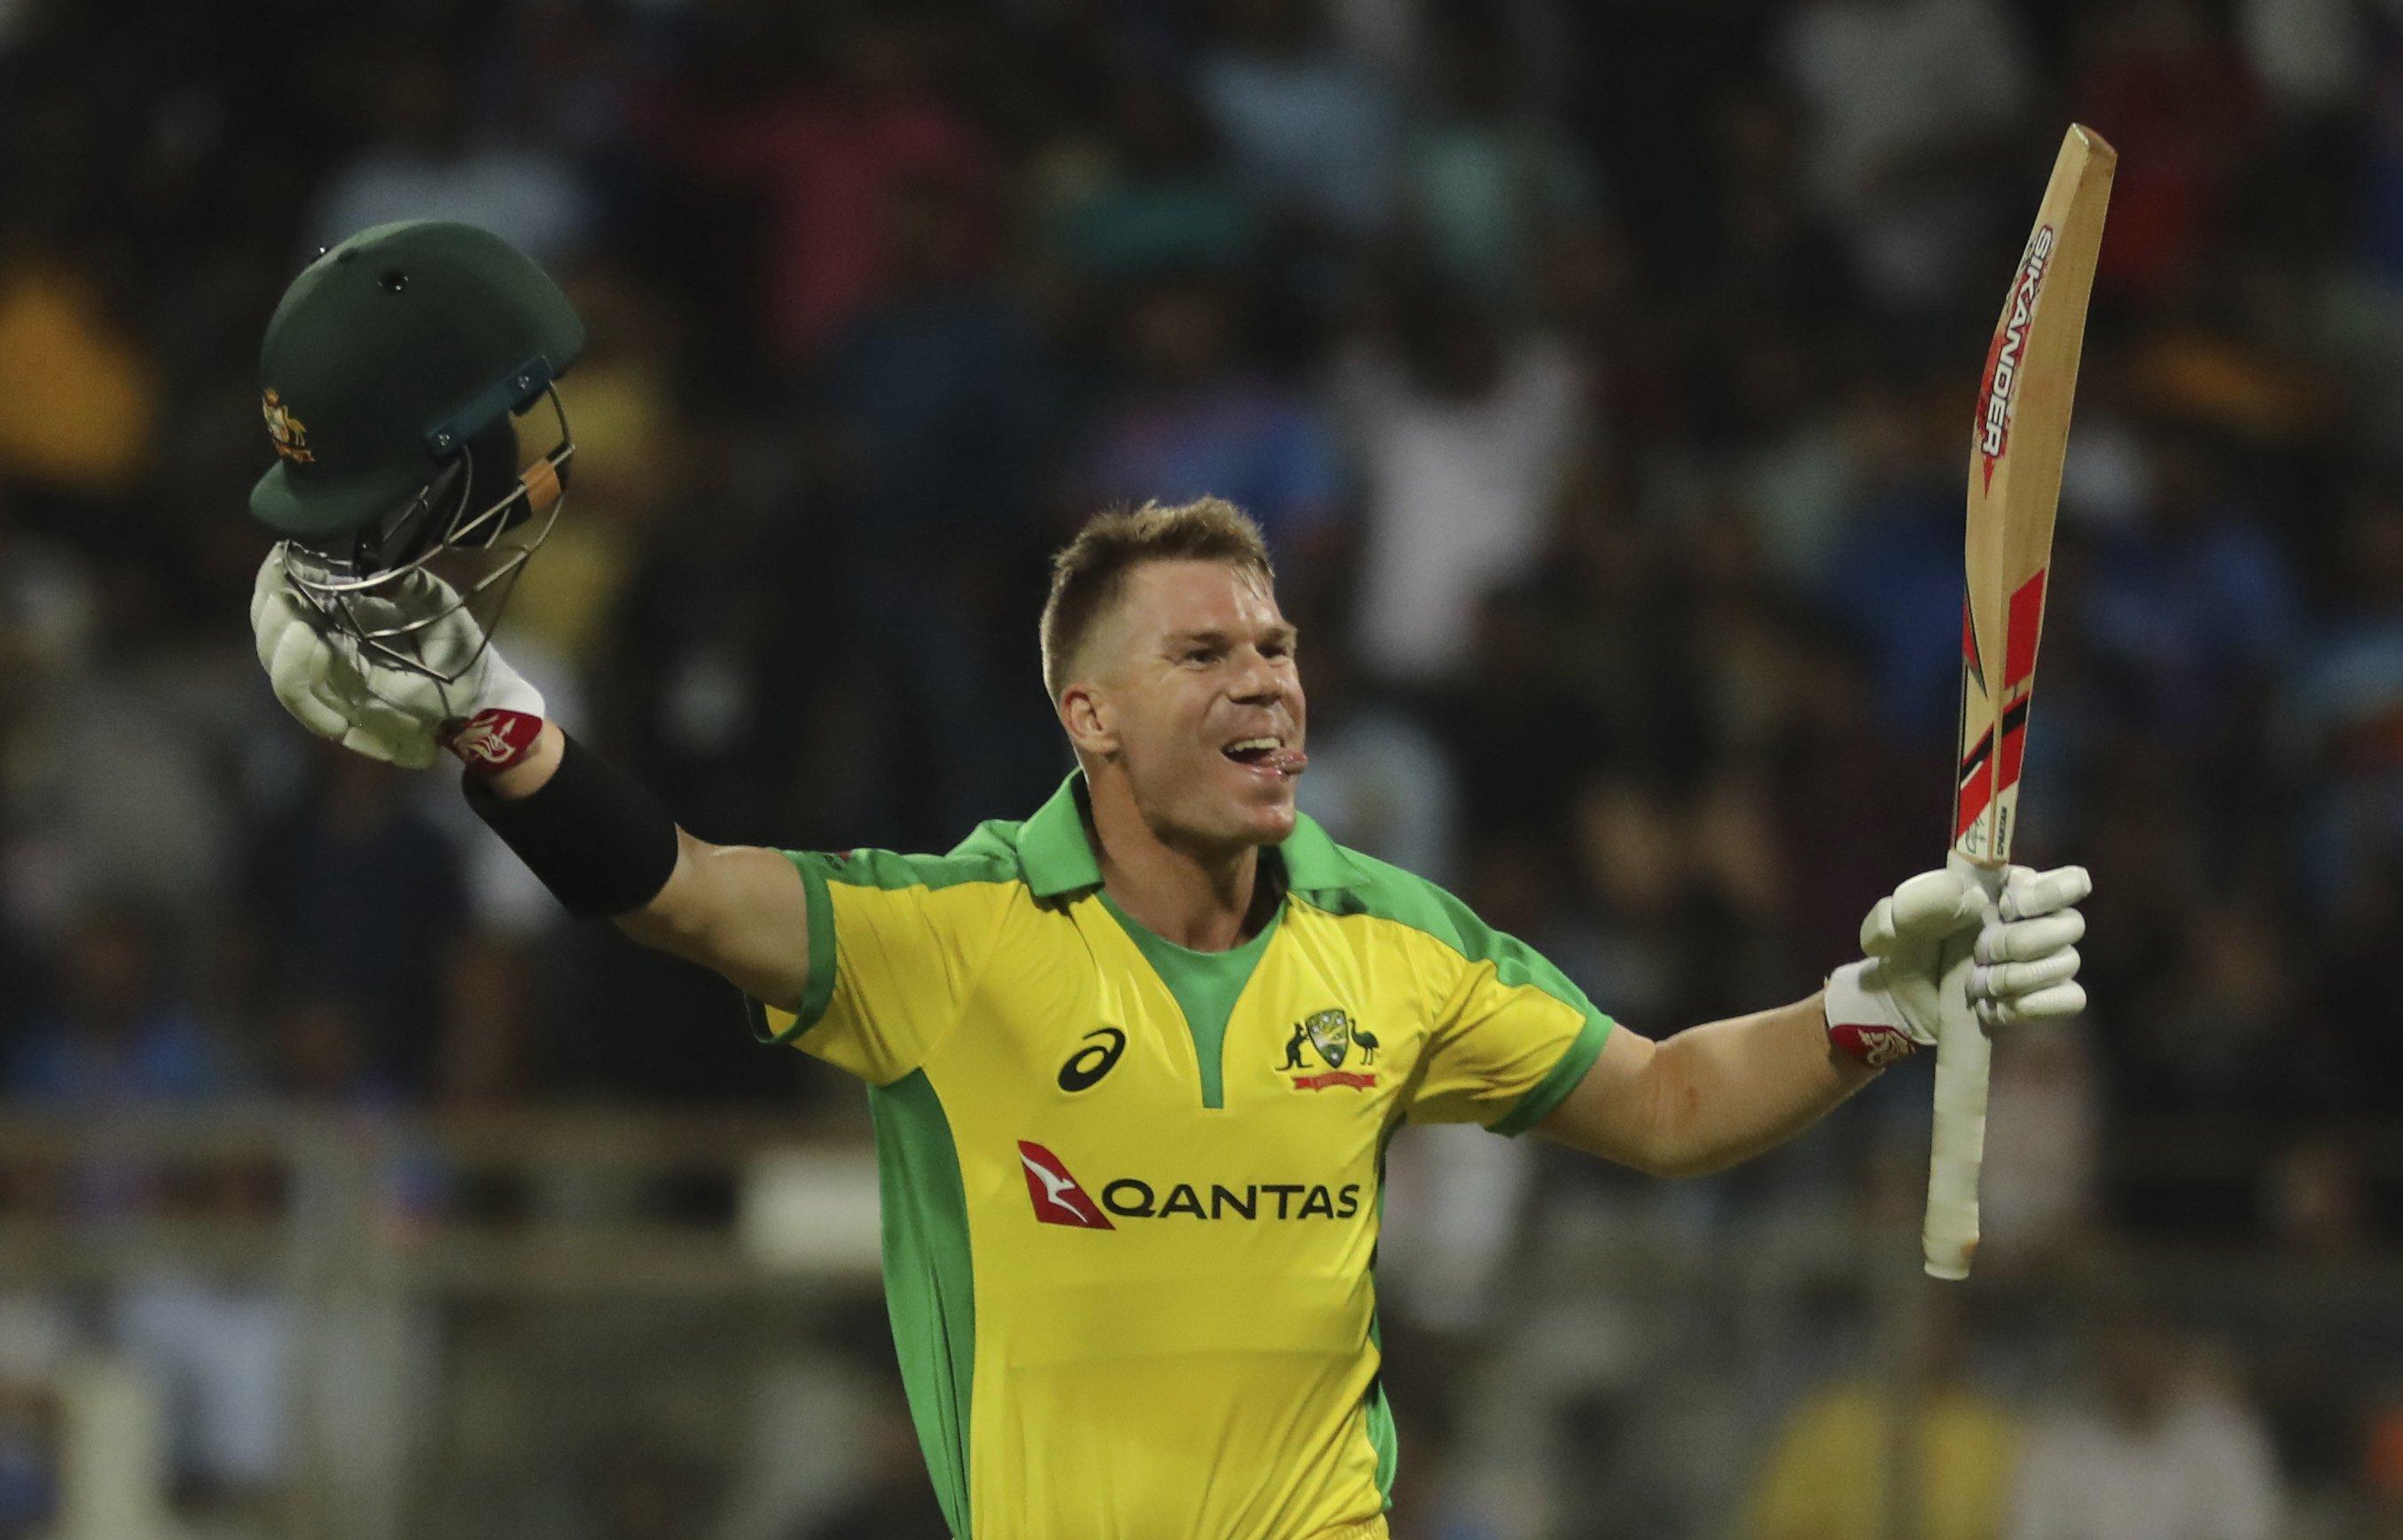 Warner edges Smith for top Australian award in comeback year